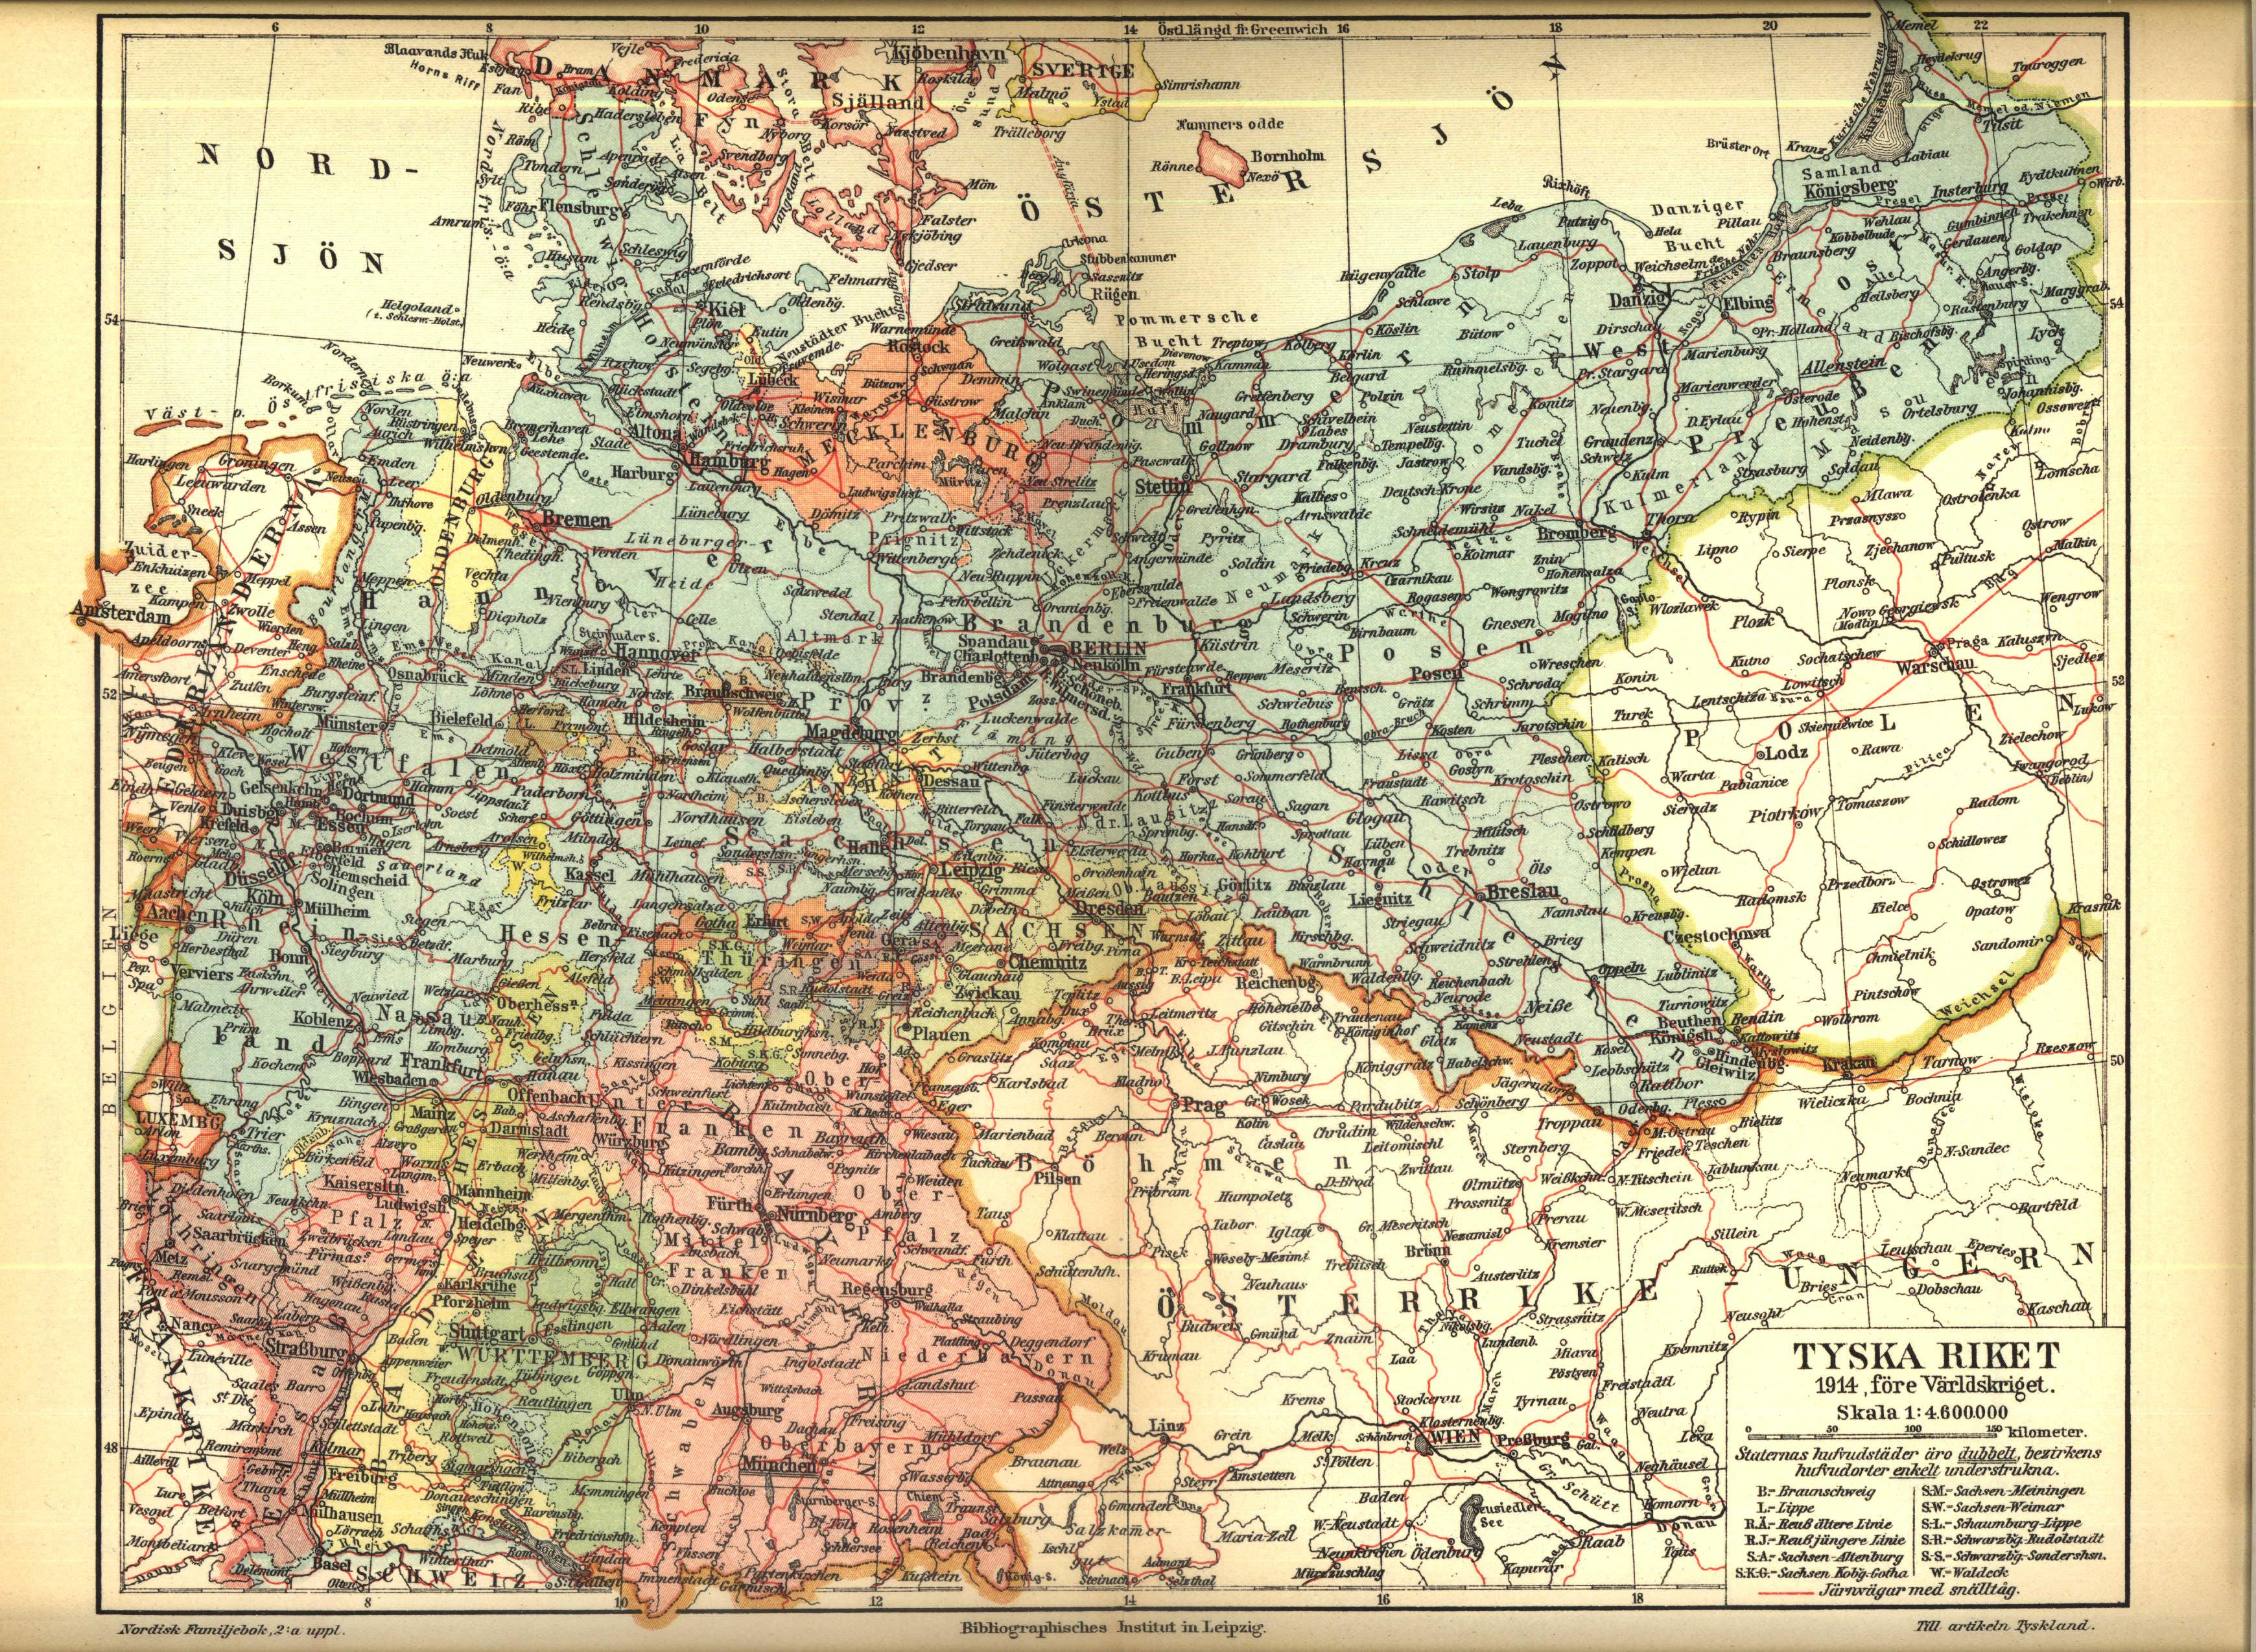 File Karta Over Tyska Riket 1914 Fore Forsta Varldskriget Ur